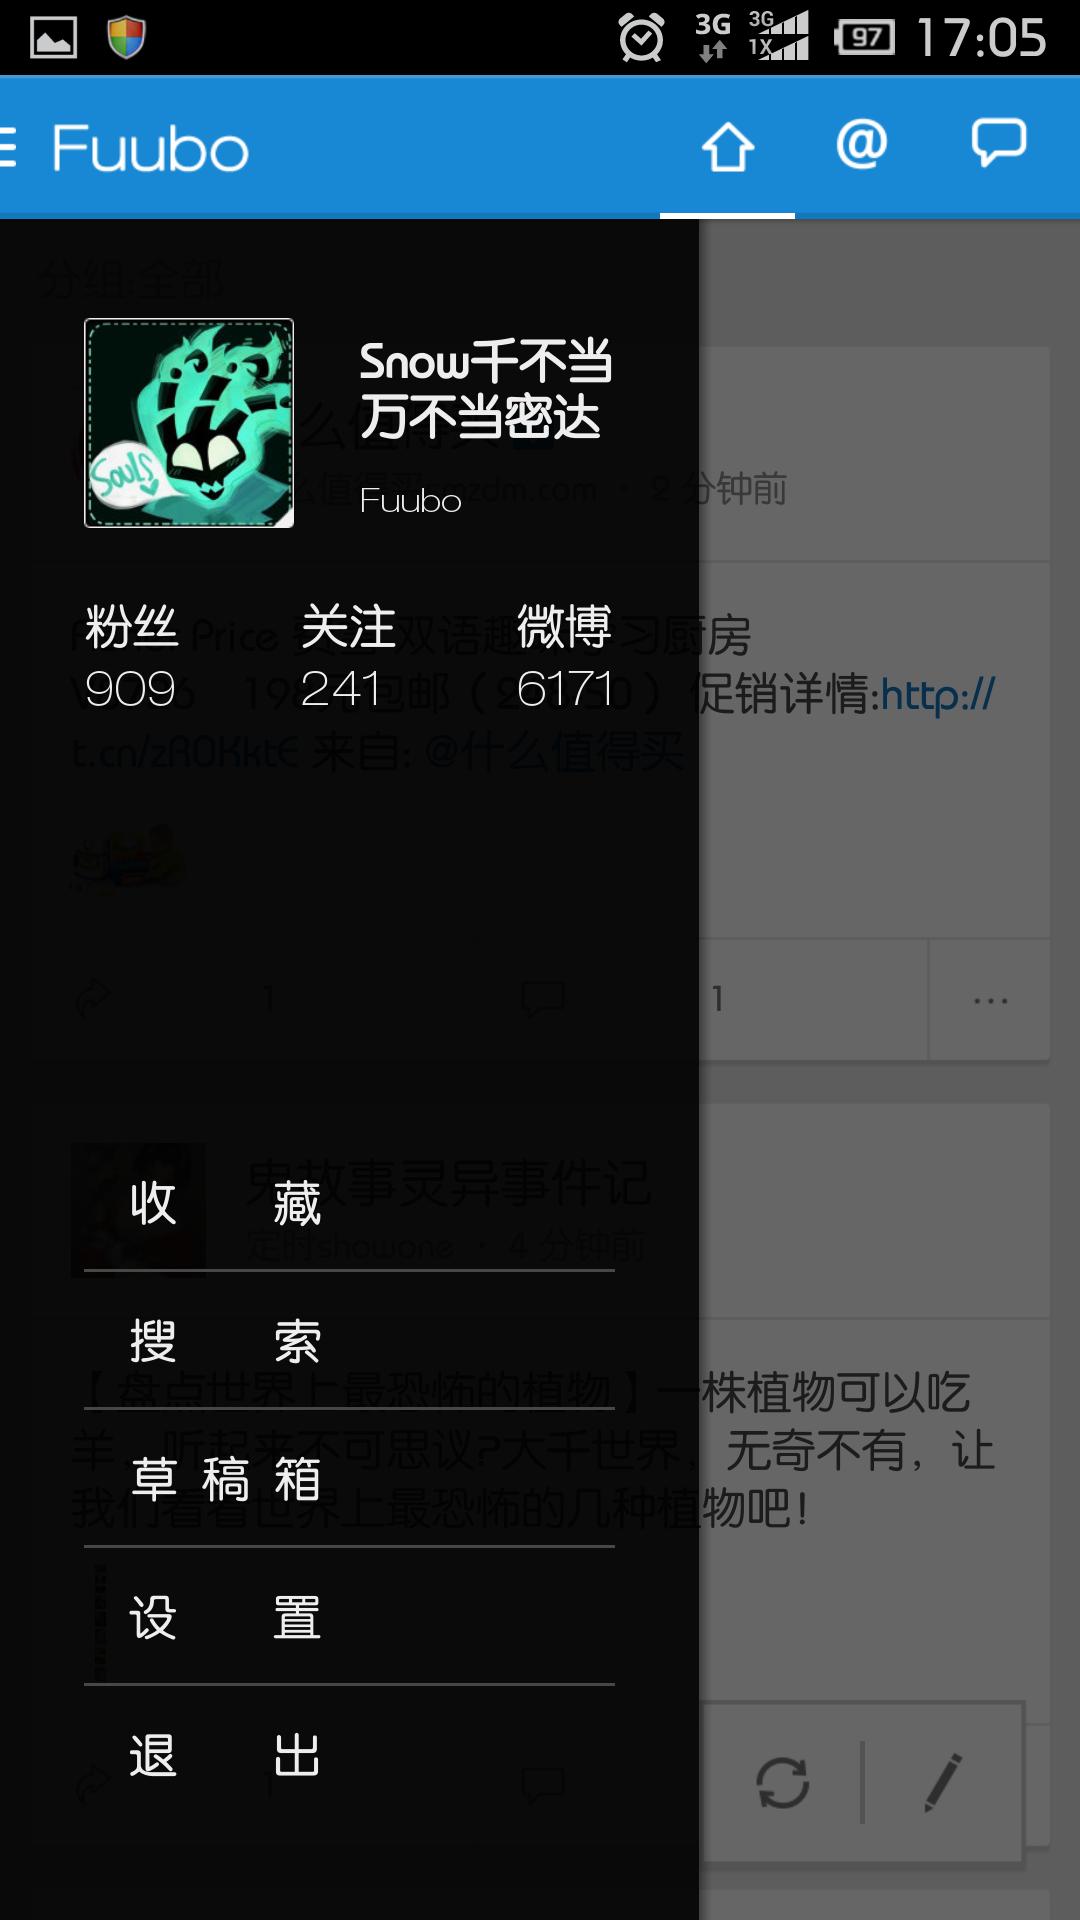 Screenshot_2013-11-05-17-05-03.png